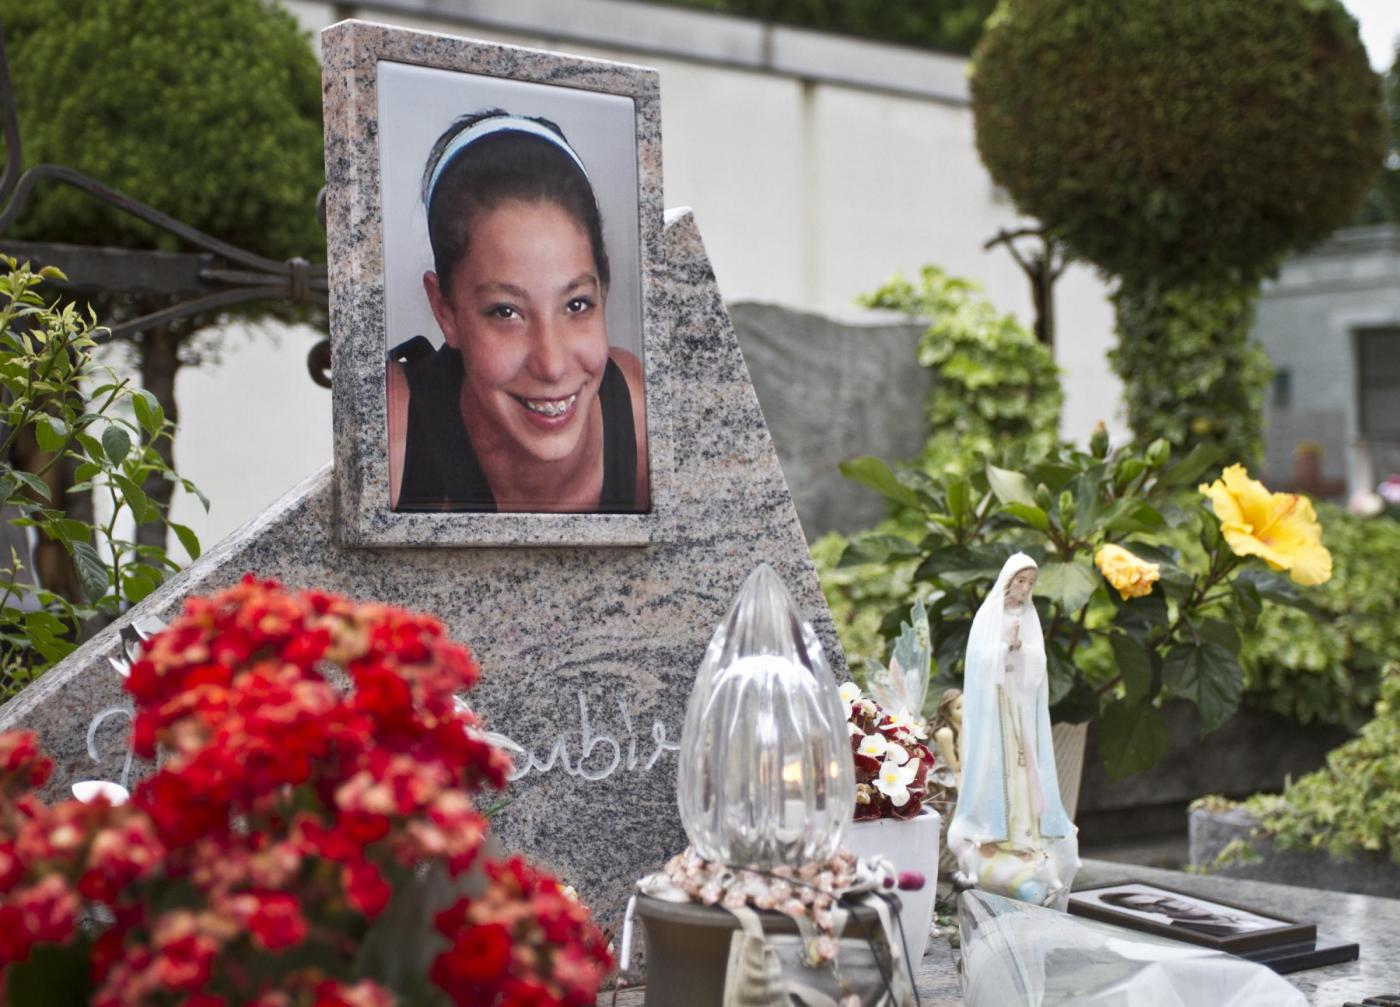 Caso Yara Gambirasio : la tomba di Yara al cimitero di Brembate